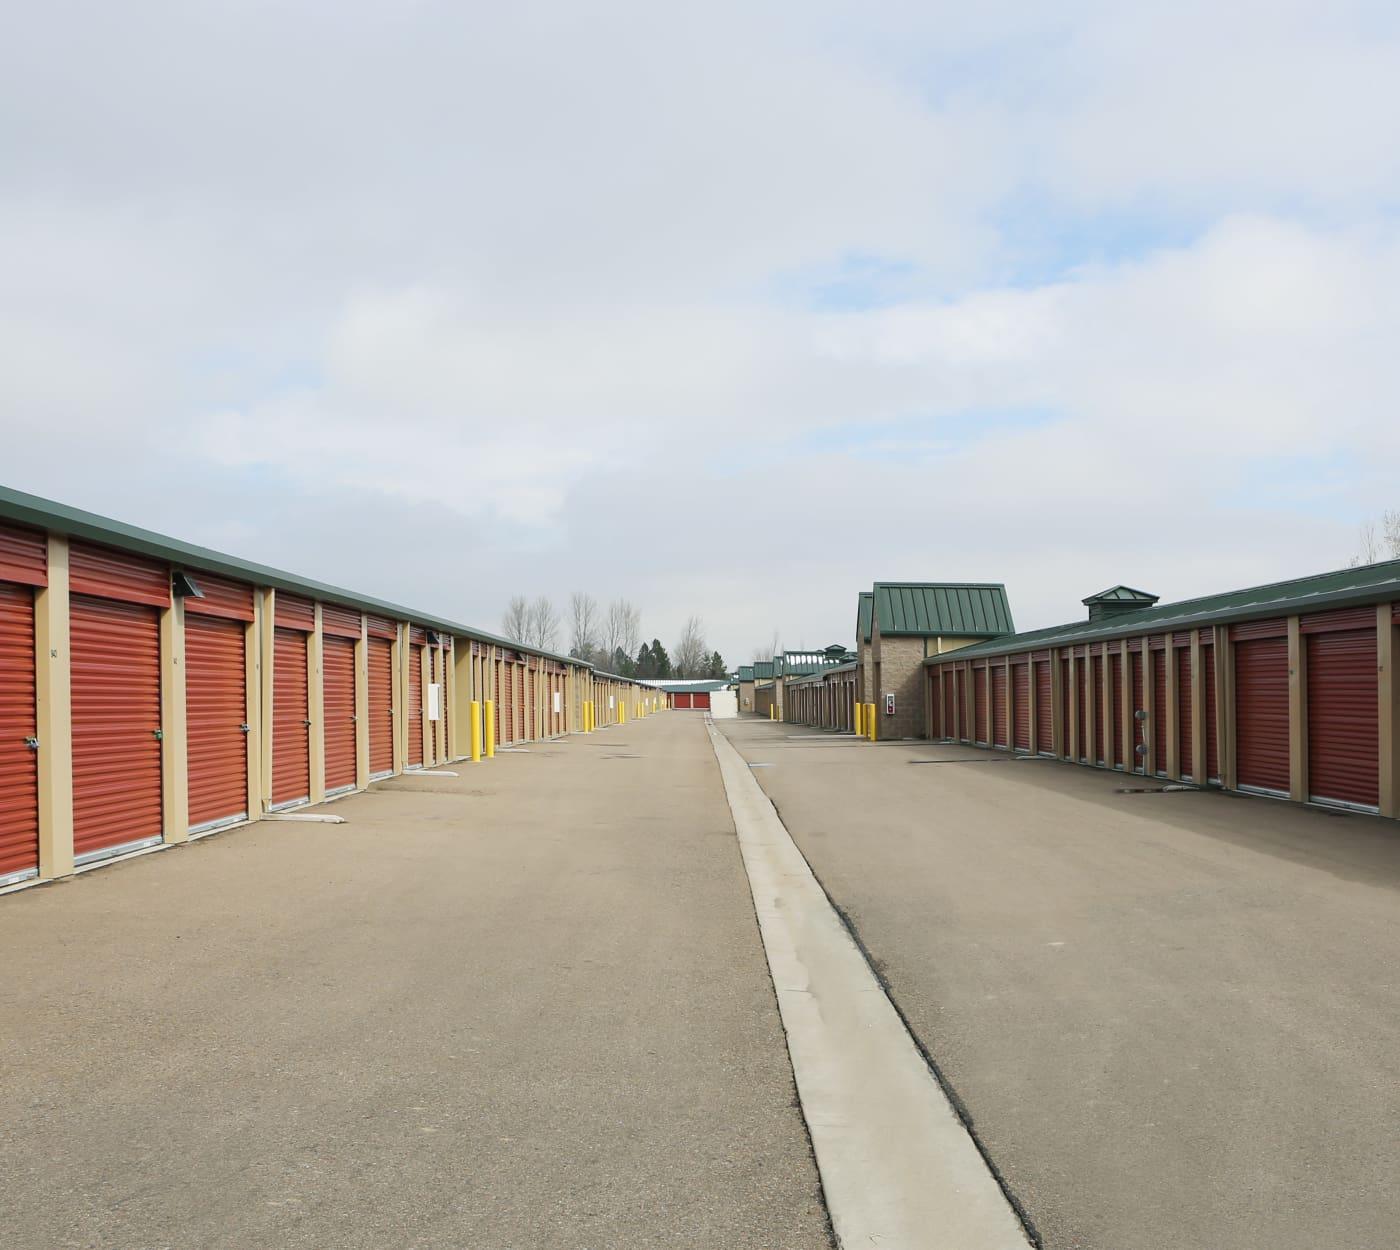 Ground-floor unit at Clover Basin Self-Storage in Longmont, Colorado